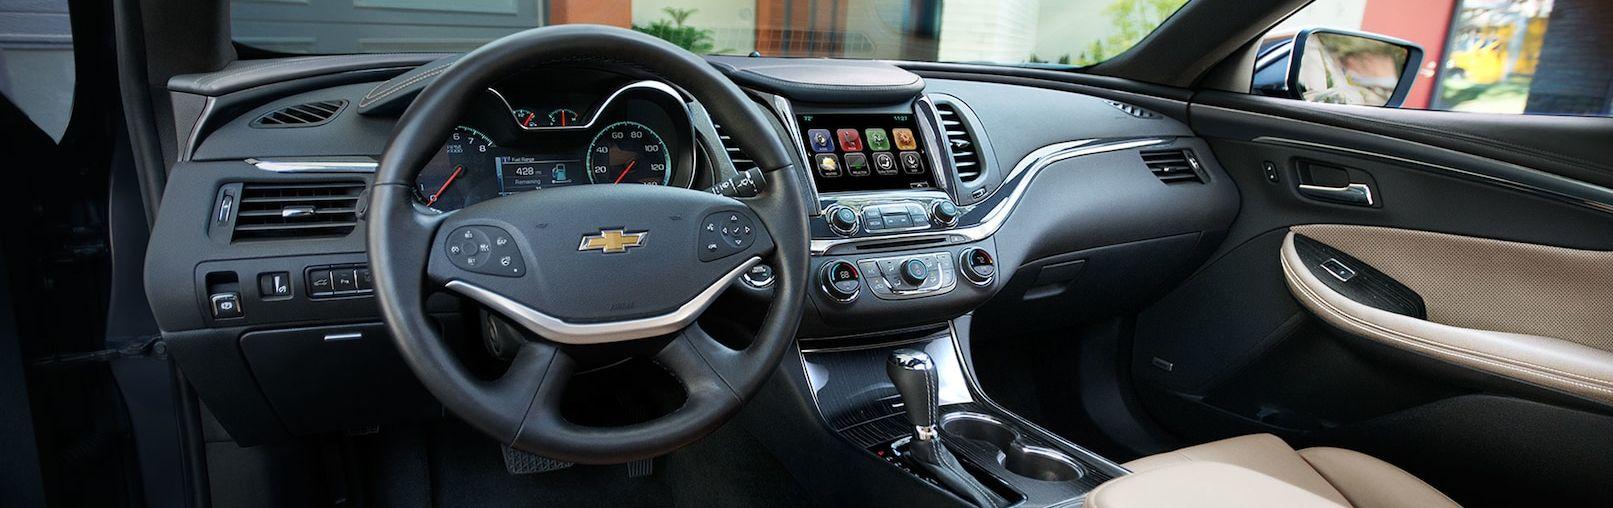 Stylish Interior of the 2019 Impala